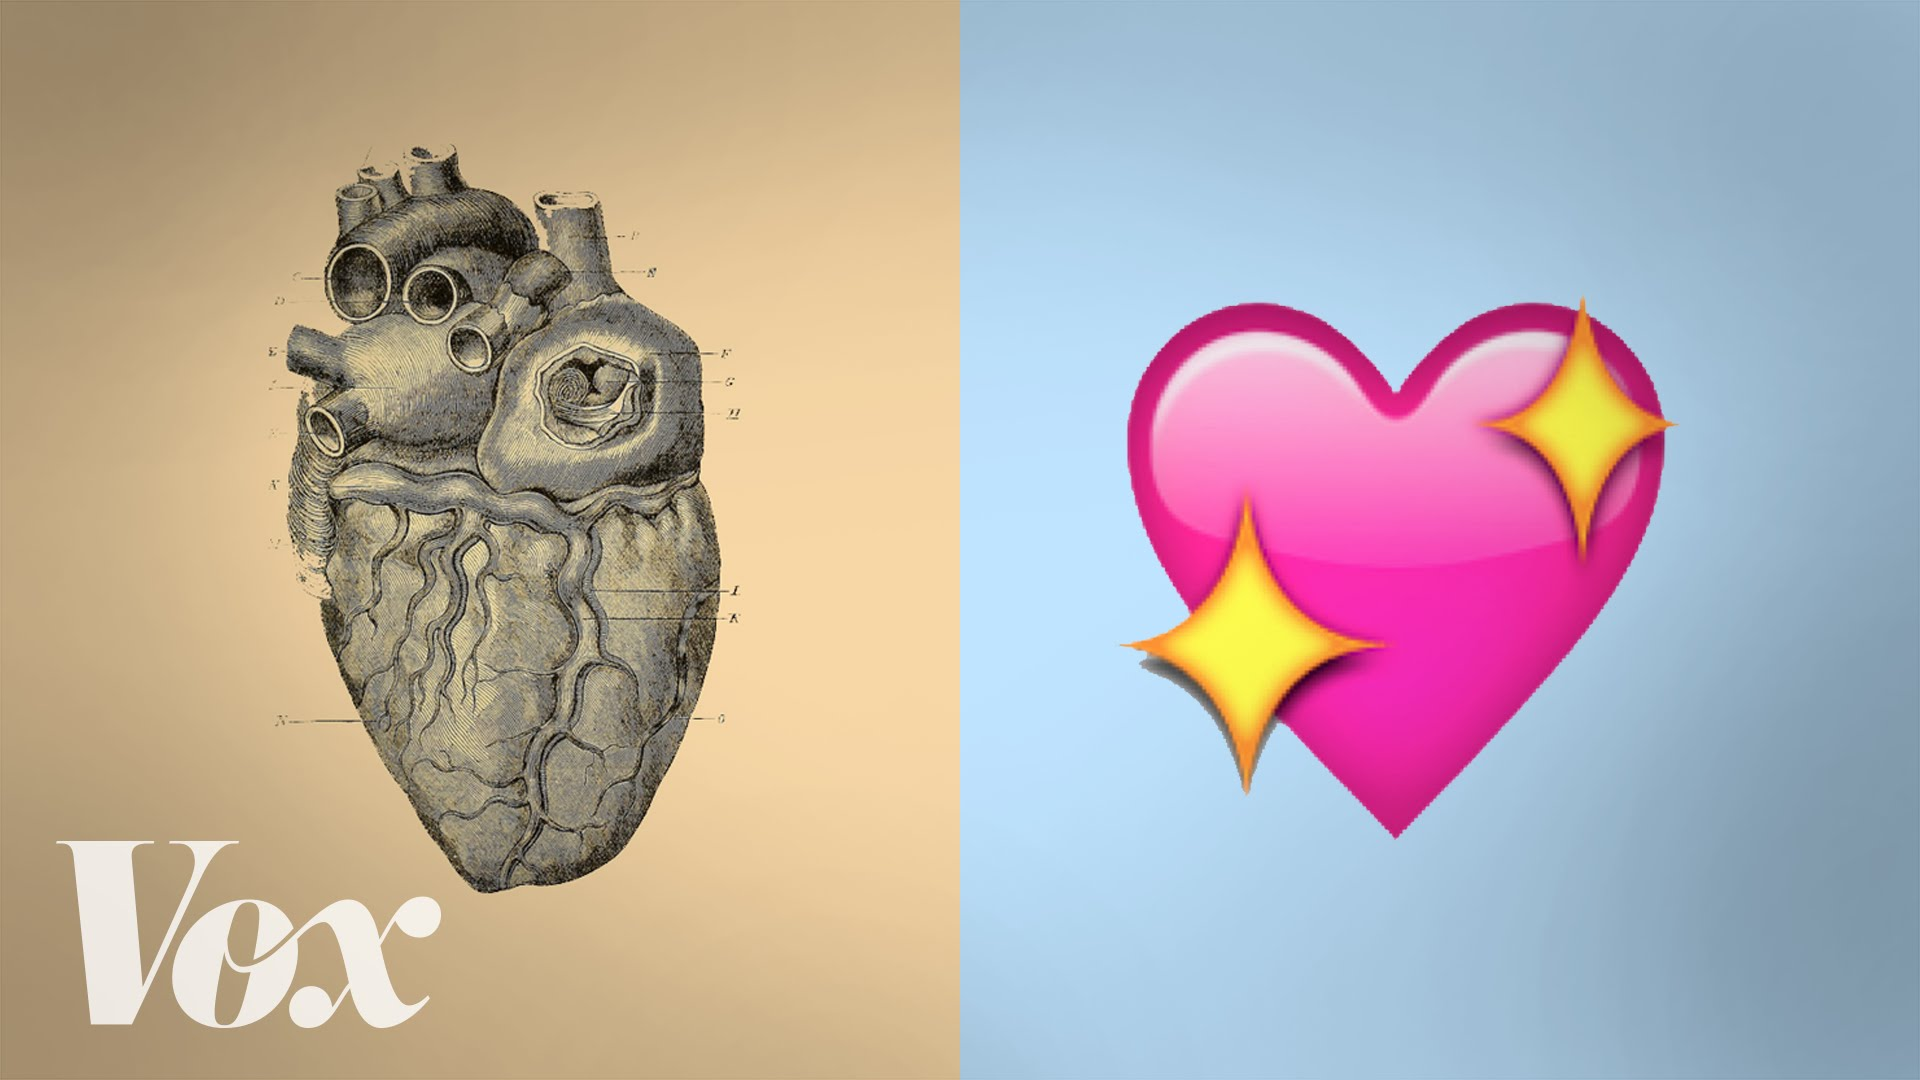 Heart Symbol - Origin